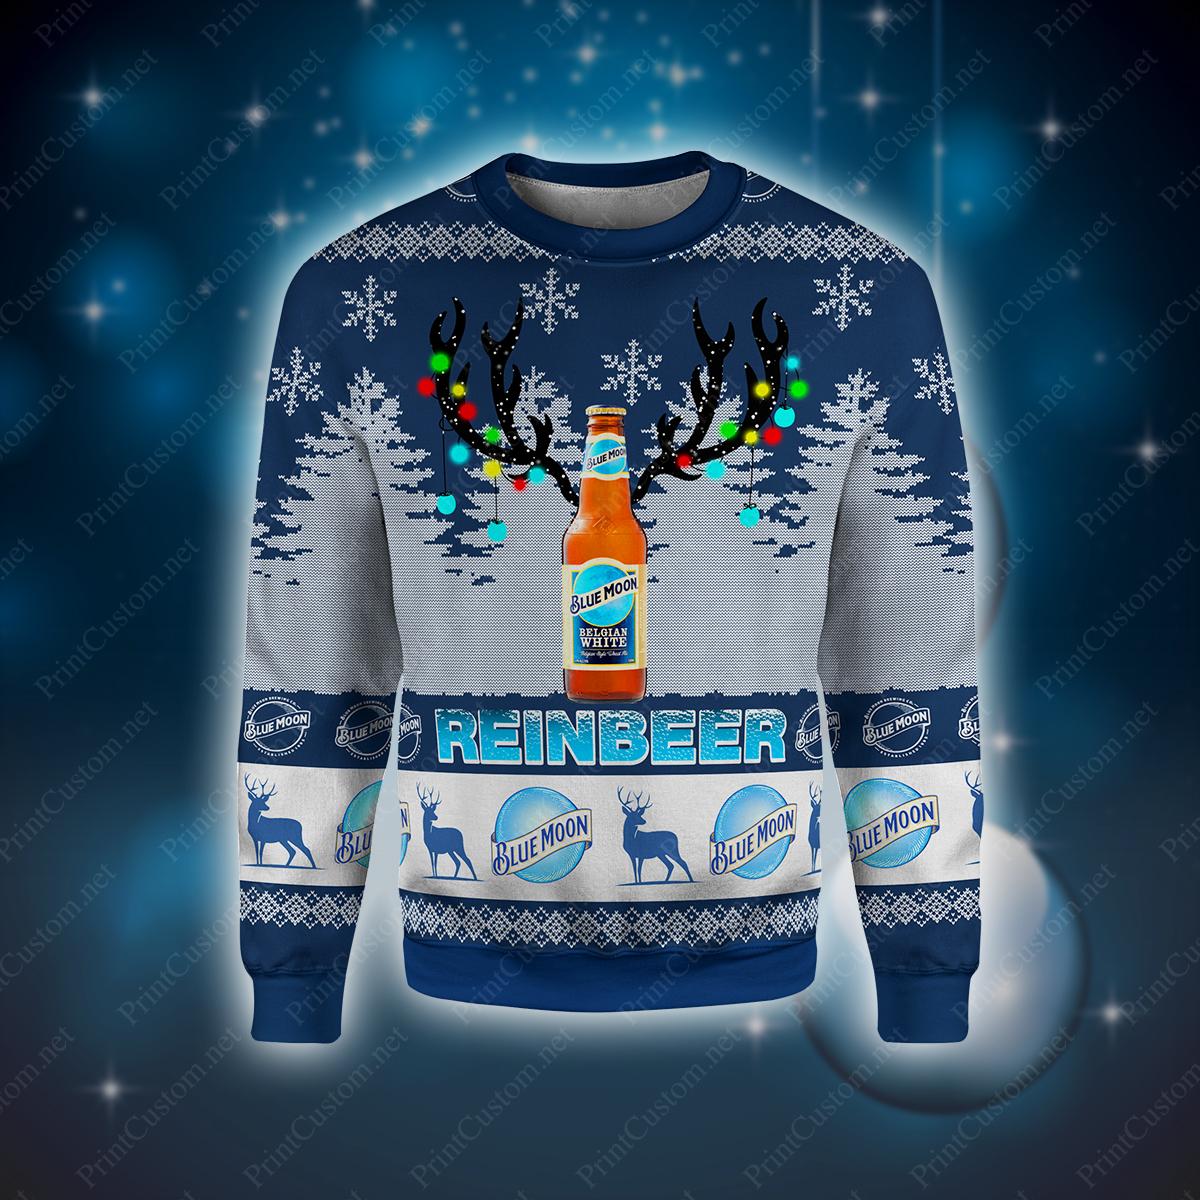 Reinbeer blue moon full printing ugly christmas sweater 1